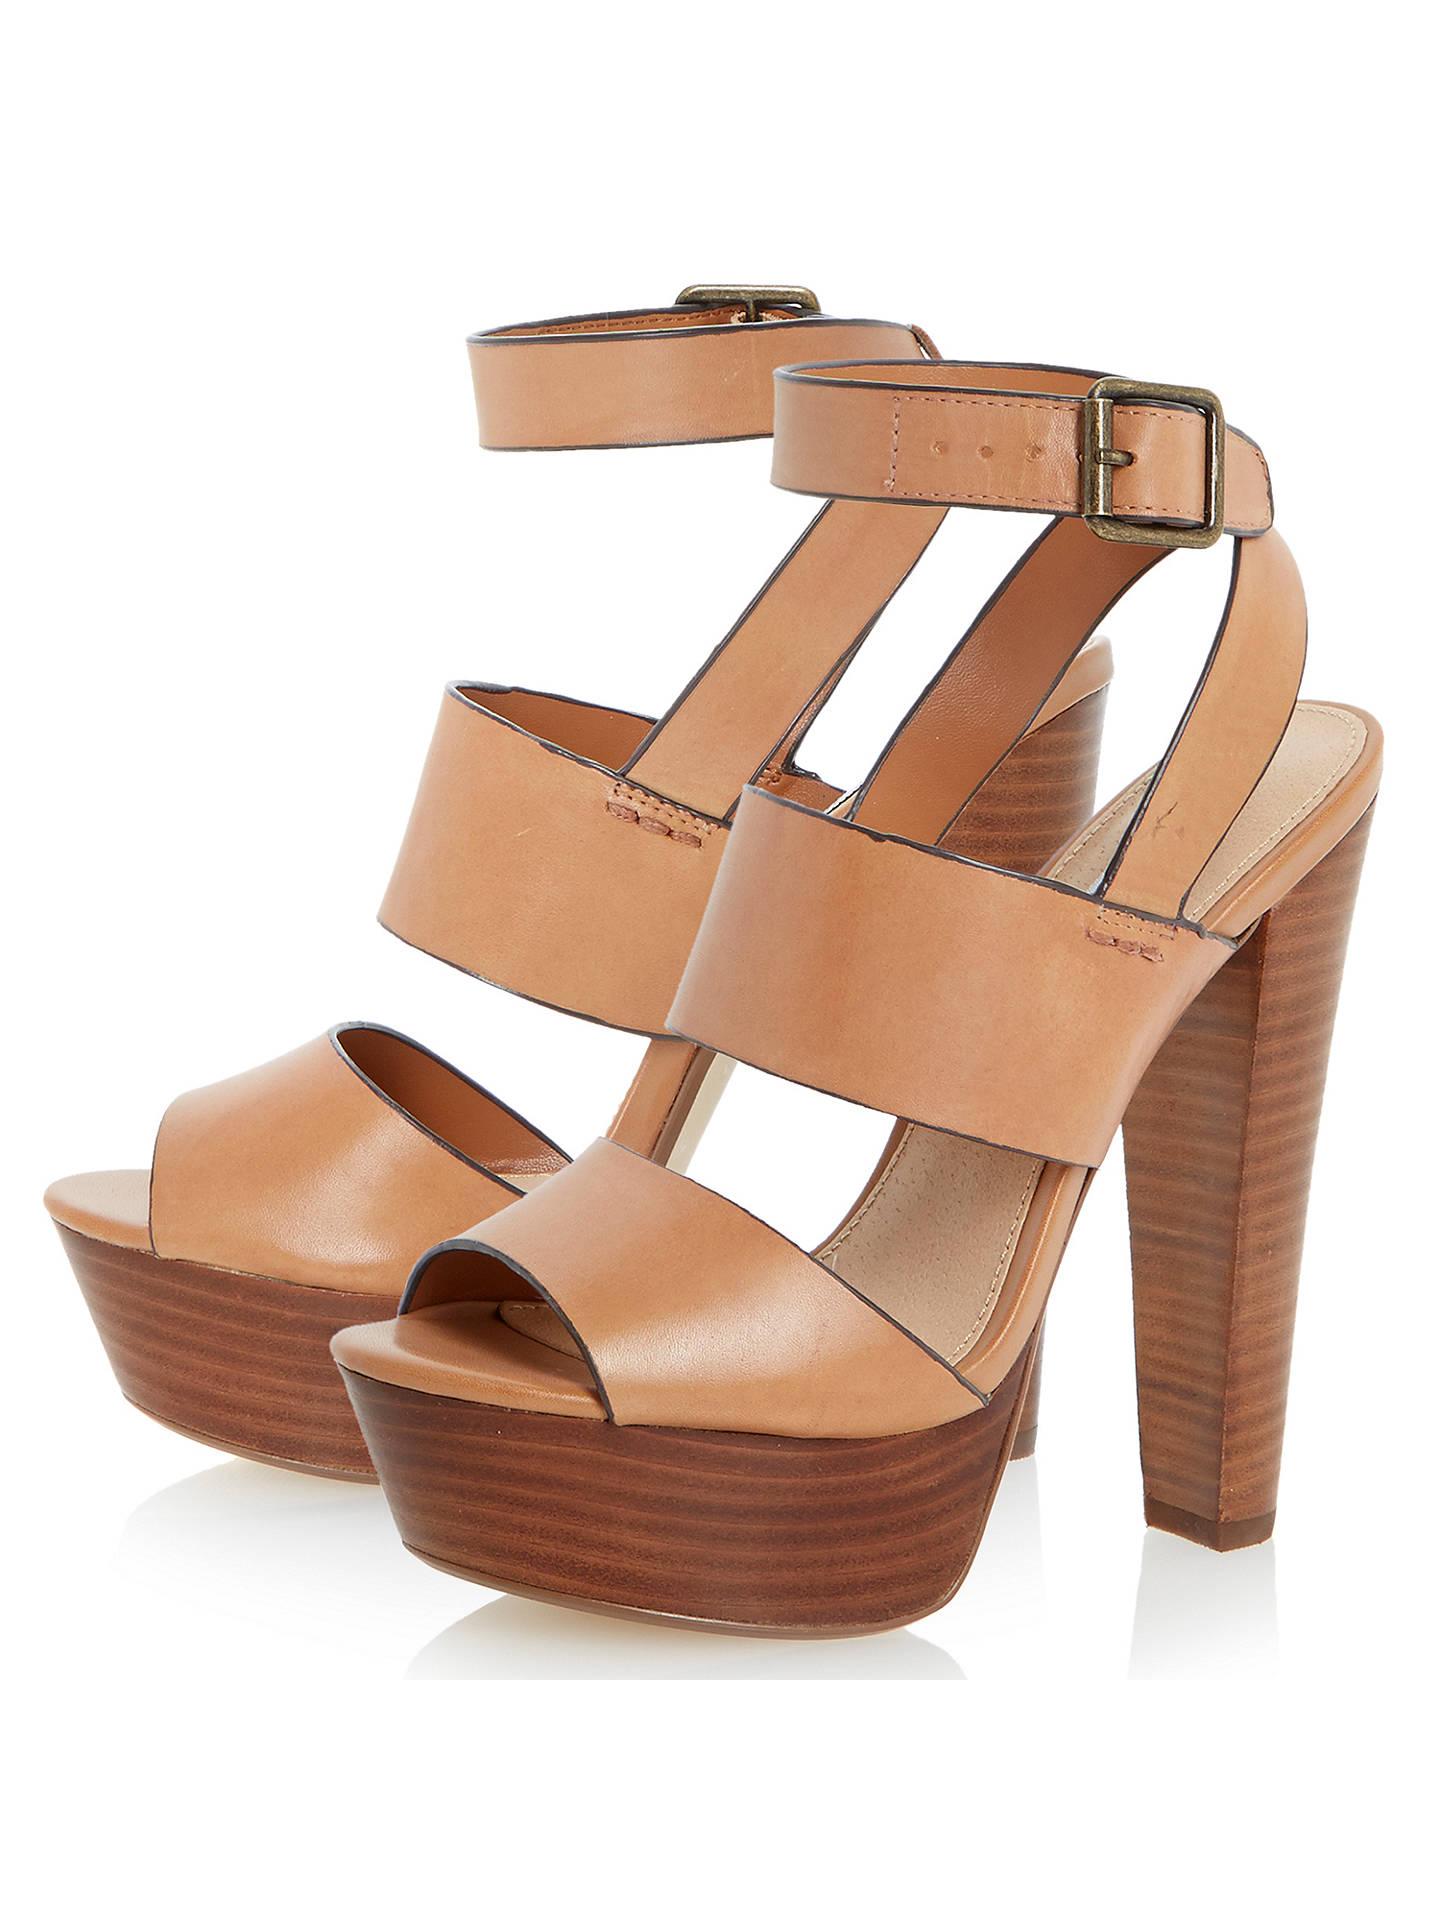 3fad573fb3e ... Buy Steve Madden Dezzzy Leather Platform Sandals